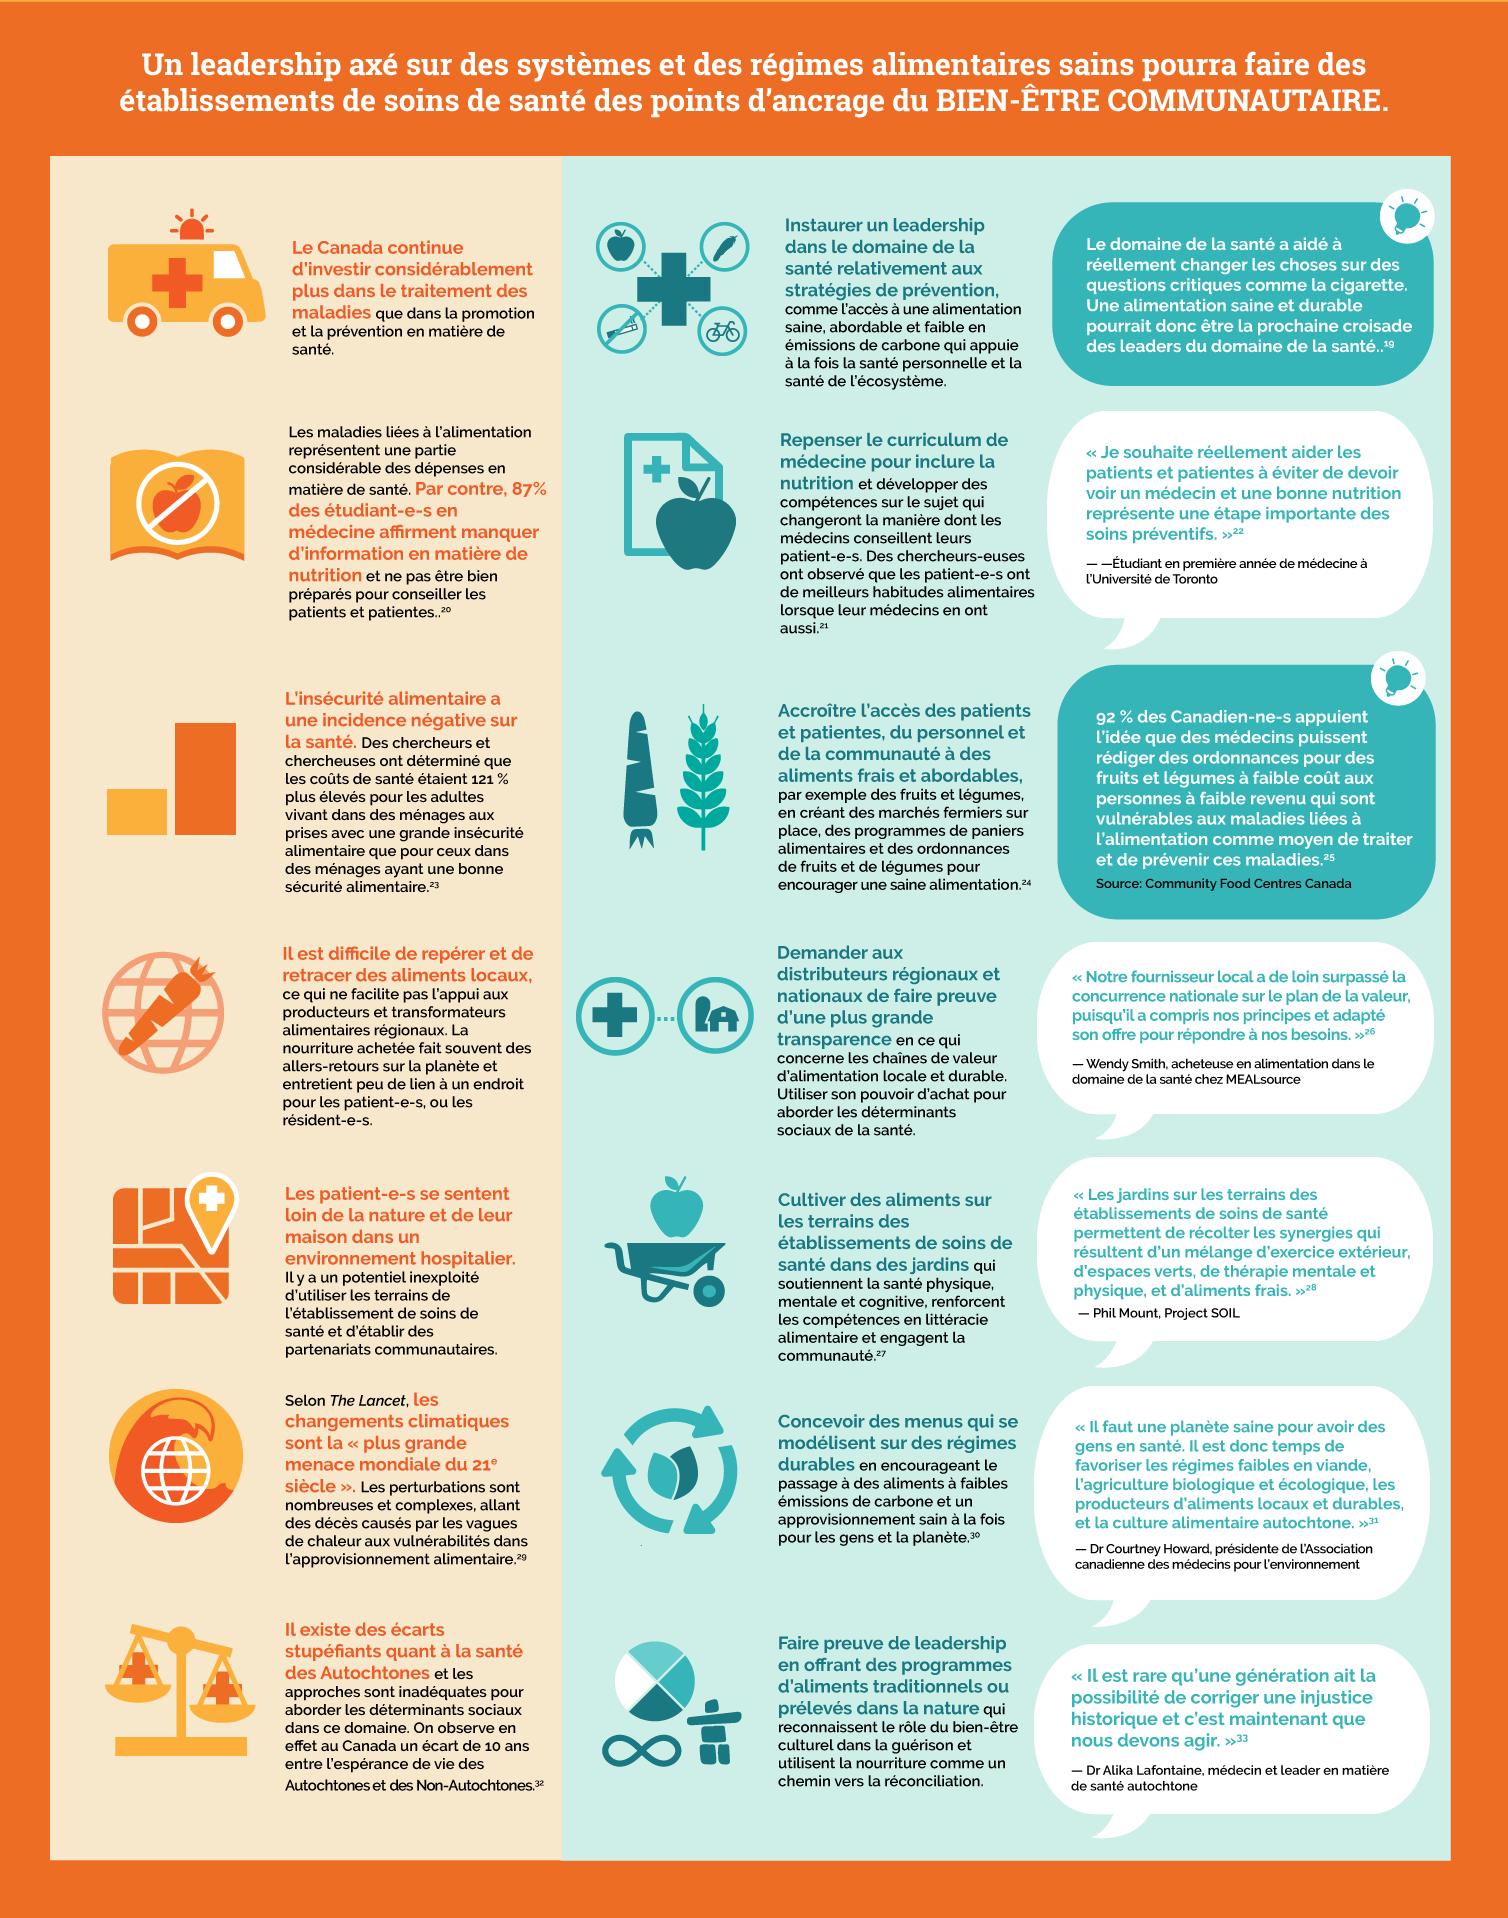 Fr-infographie-4.png